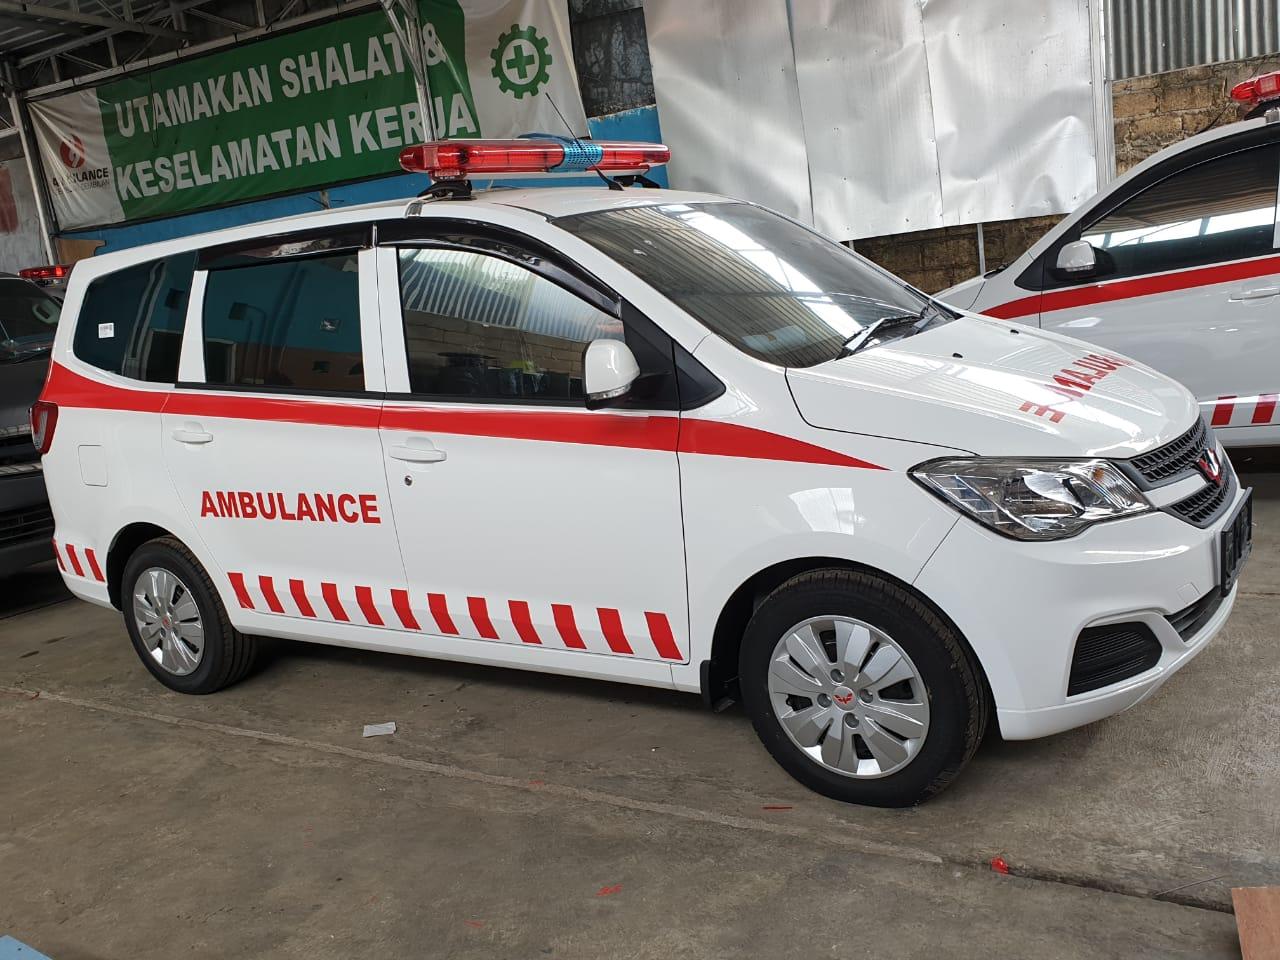 Jasa Pembuatan Ambulance